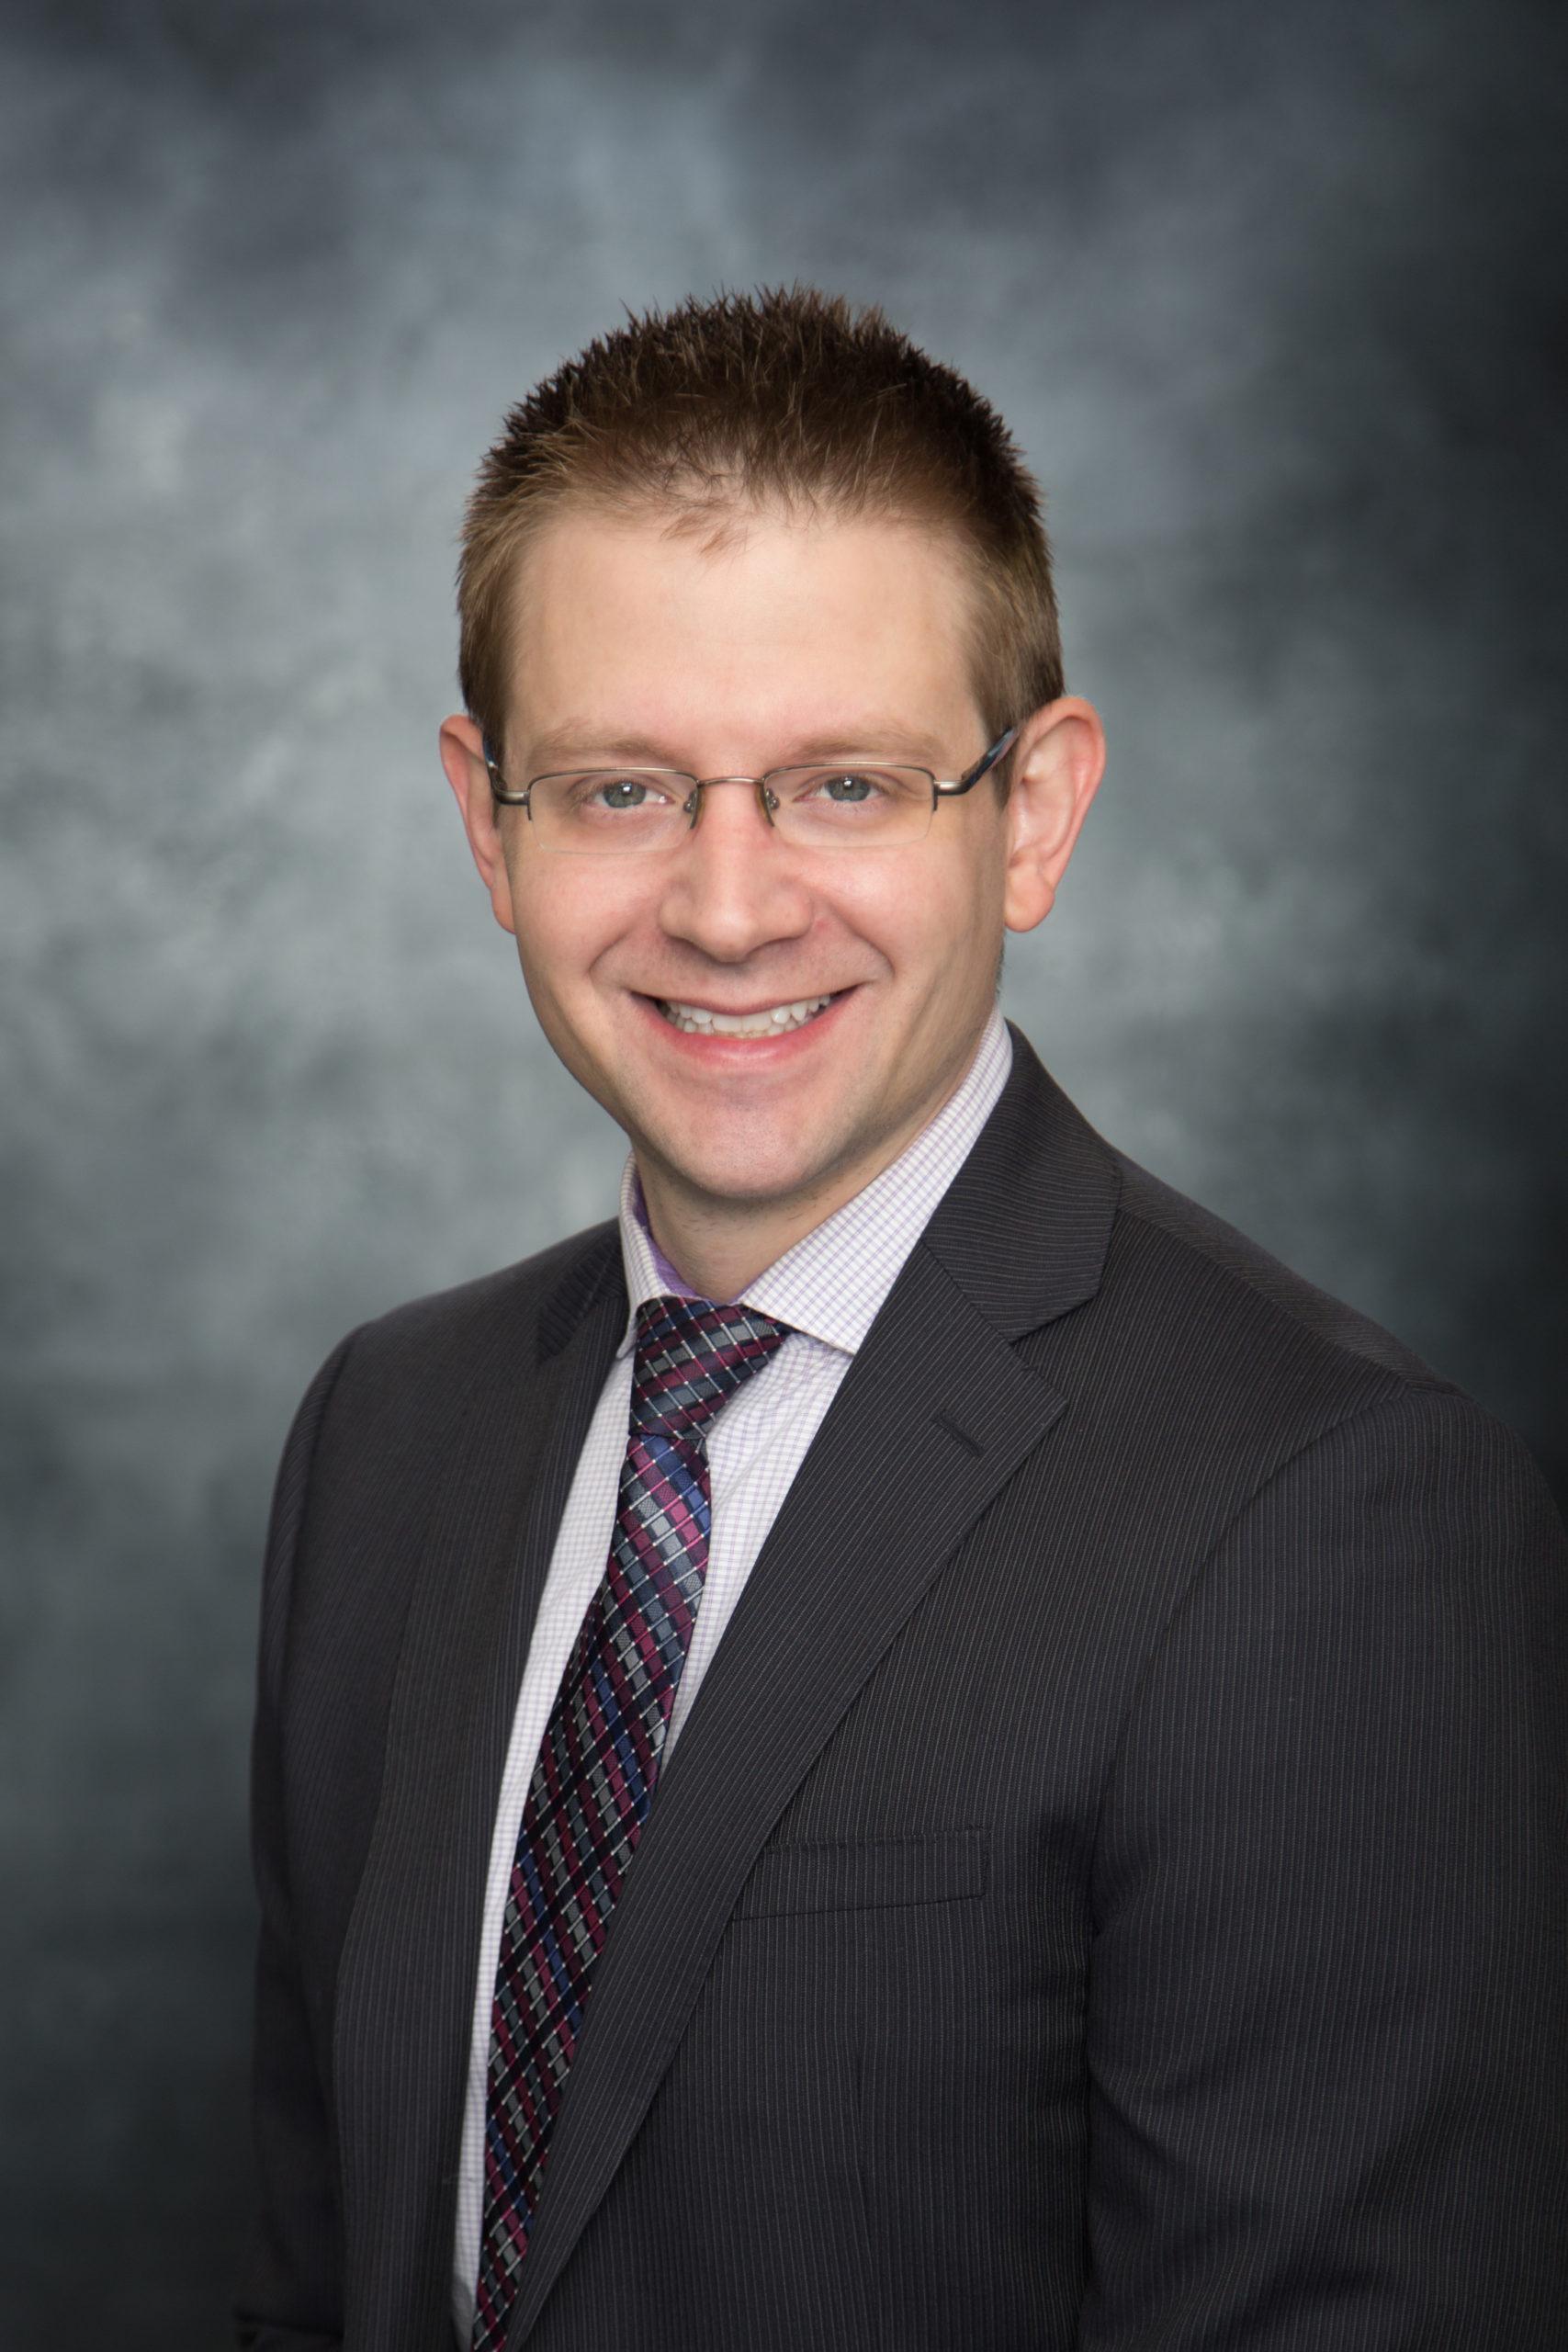 Joseph M. Ajdinovich, MD, Joins HSHS St. Anthony's Memorial Hospital's Medical Staff